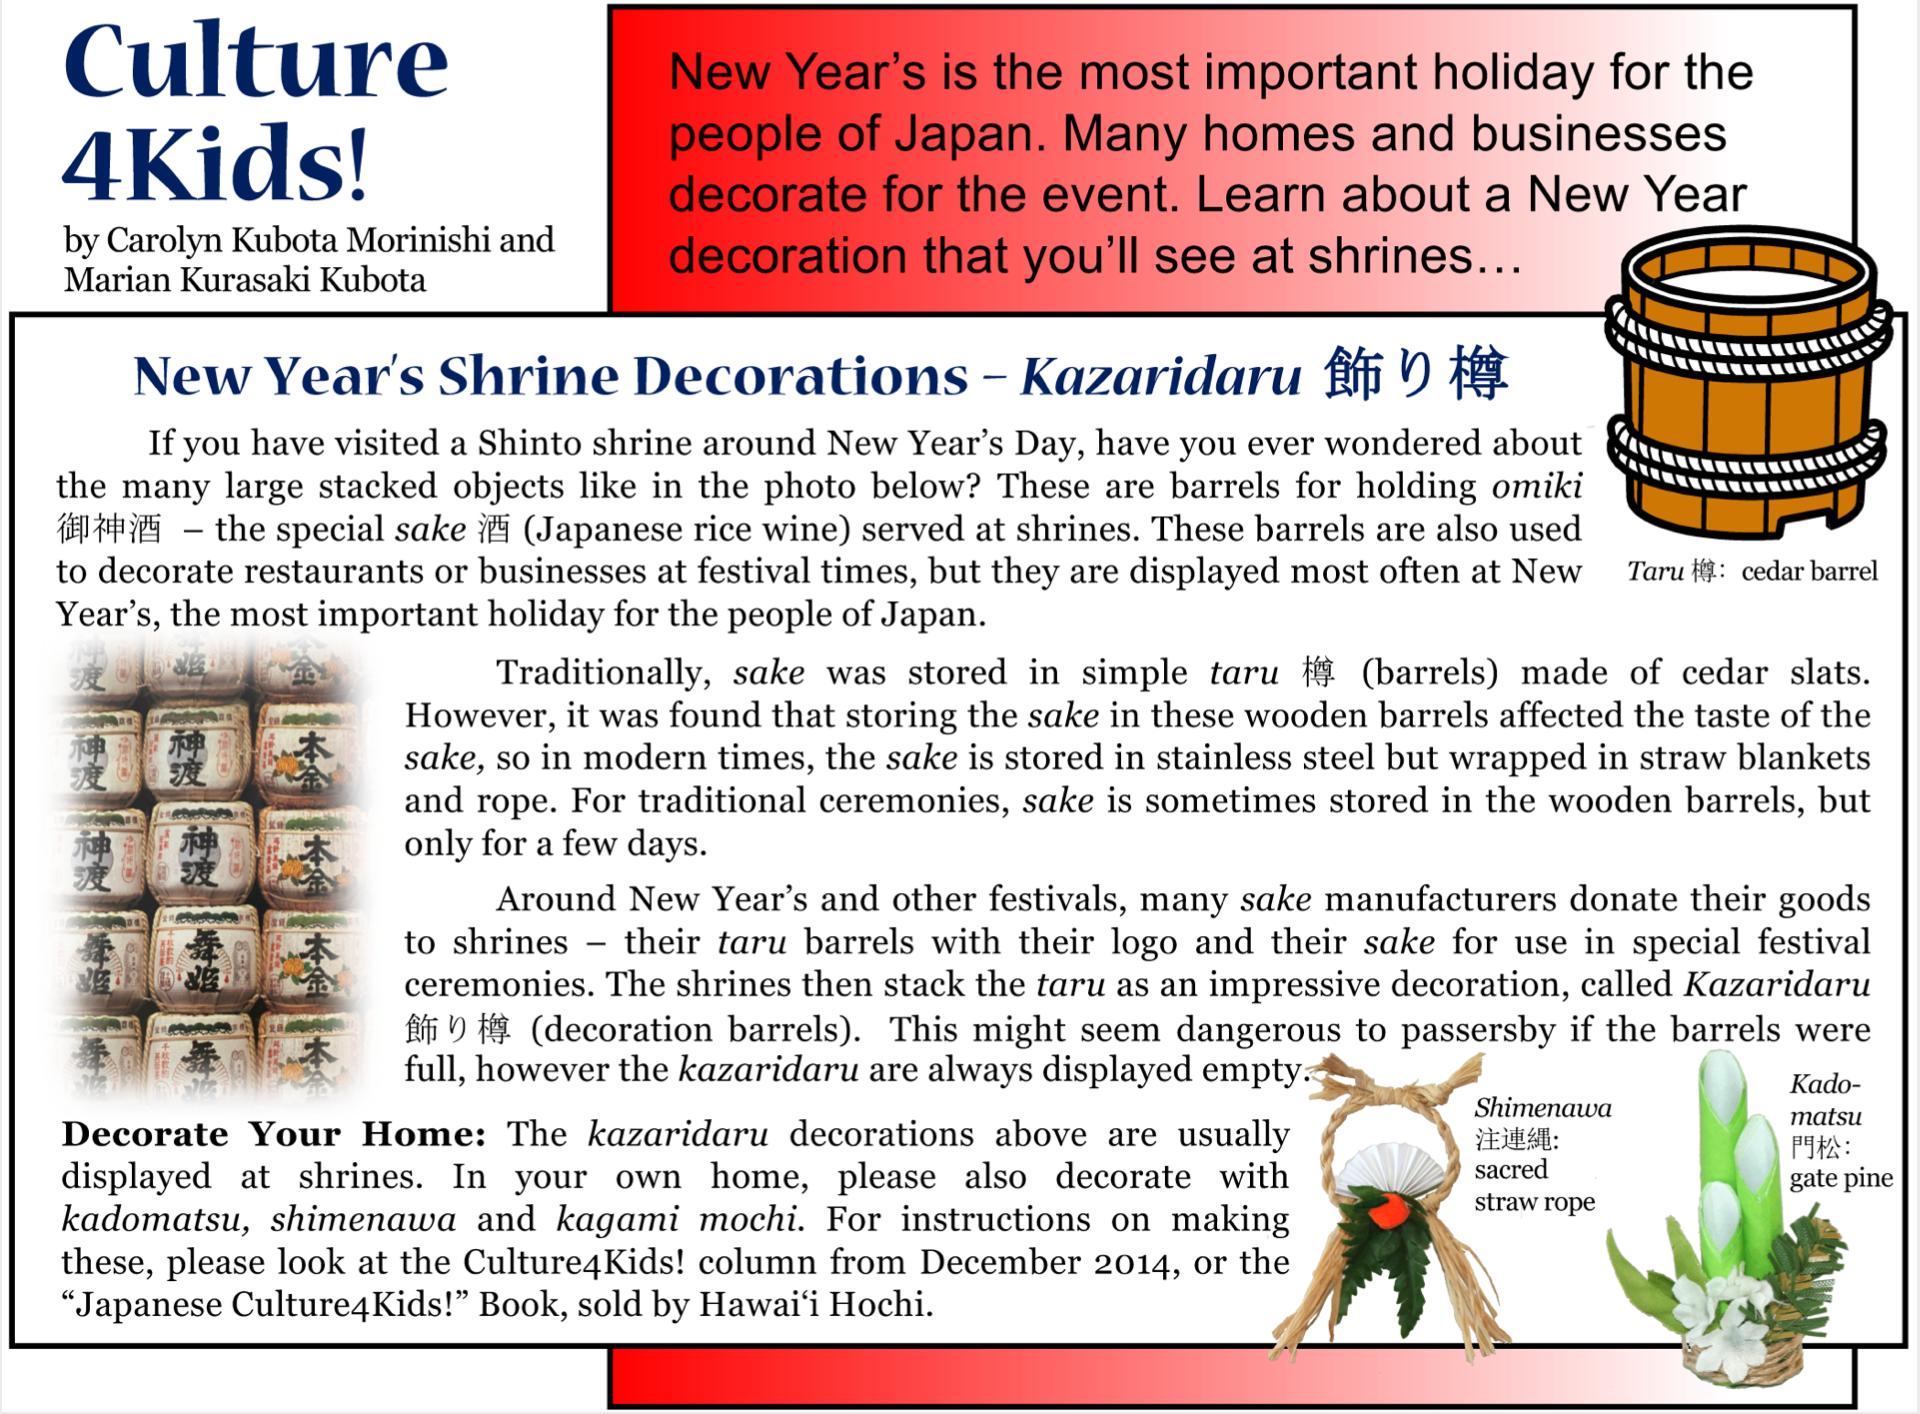 Culture4Kids! 'New Year's Shrine Decorations' Kazaridaru